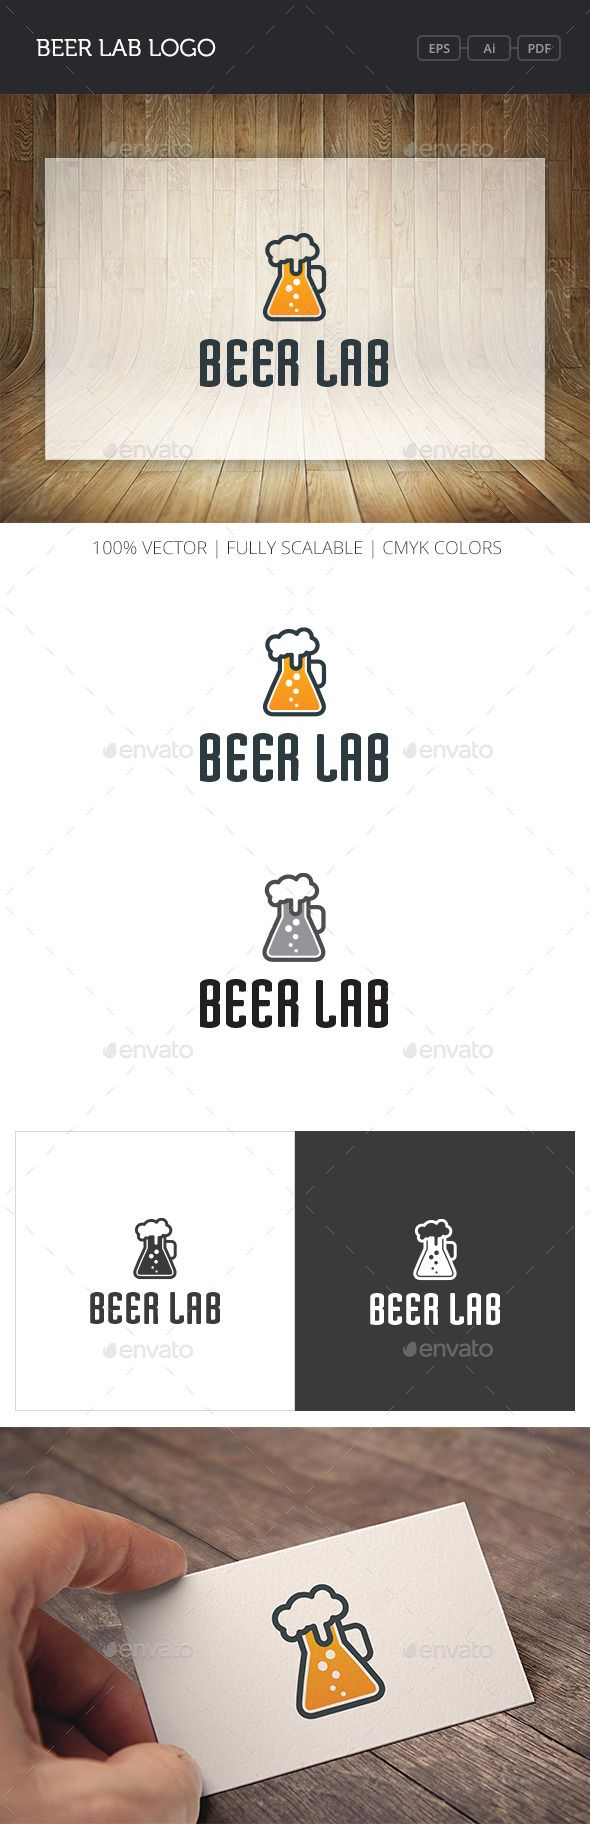 Beer Lab Logo Design Template Vector #logotype Download it here: http://graphicriver.net/item/beer-lab-logo/11064020?s_rank=456?ref=nexion